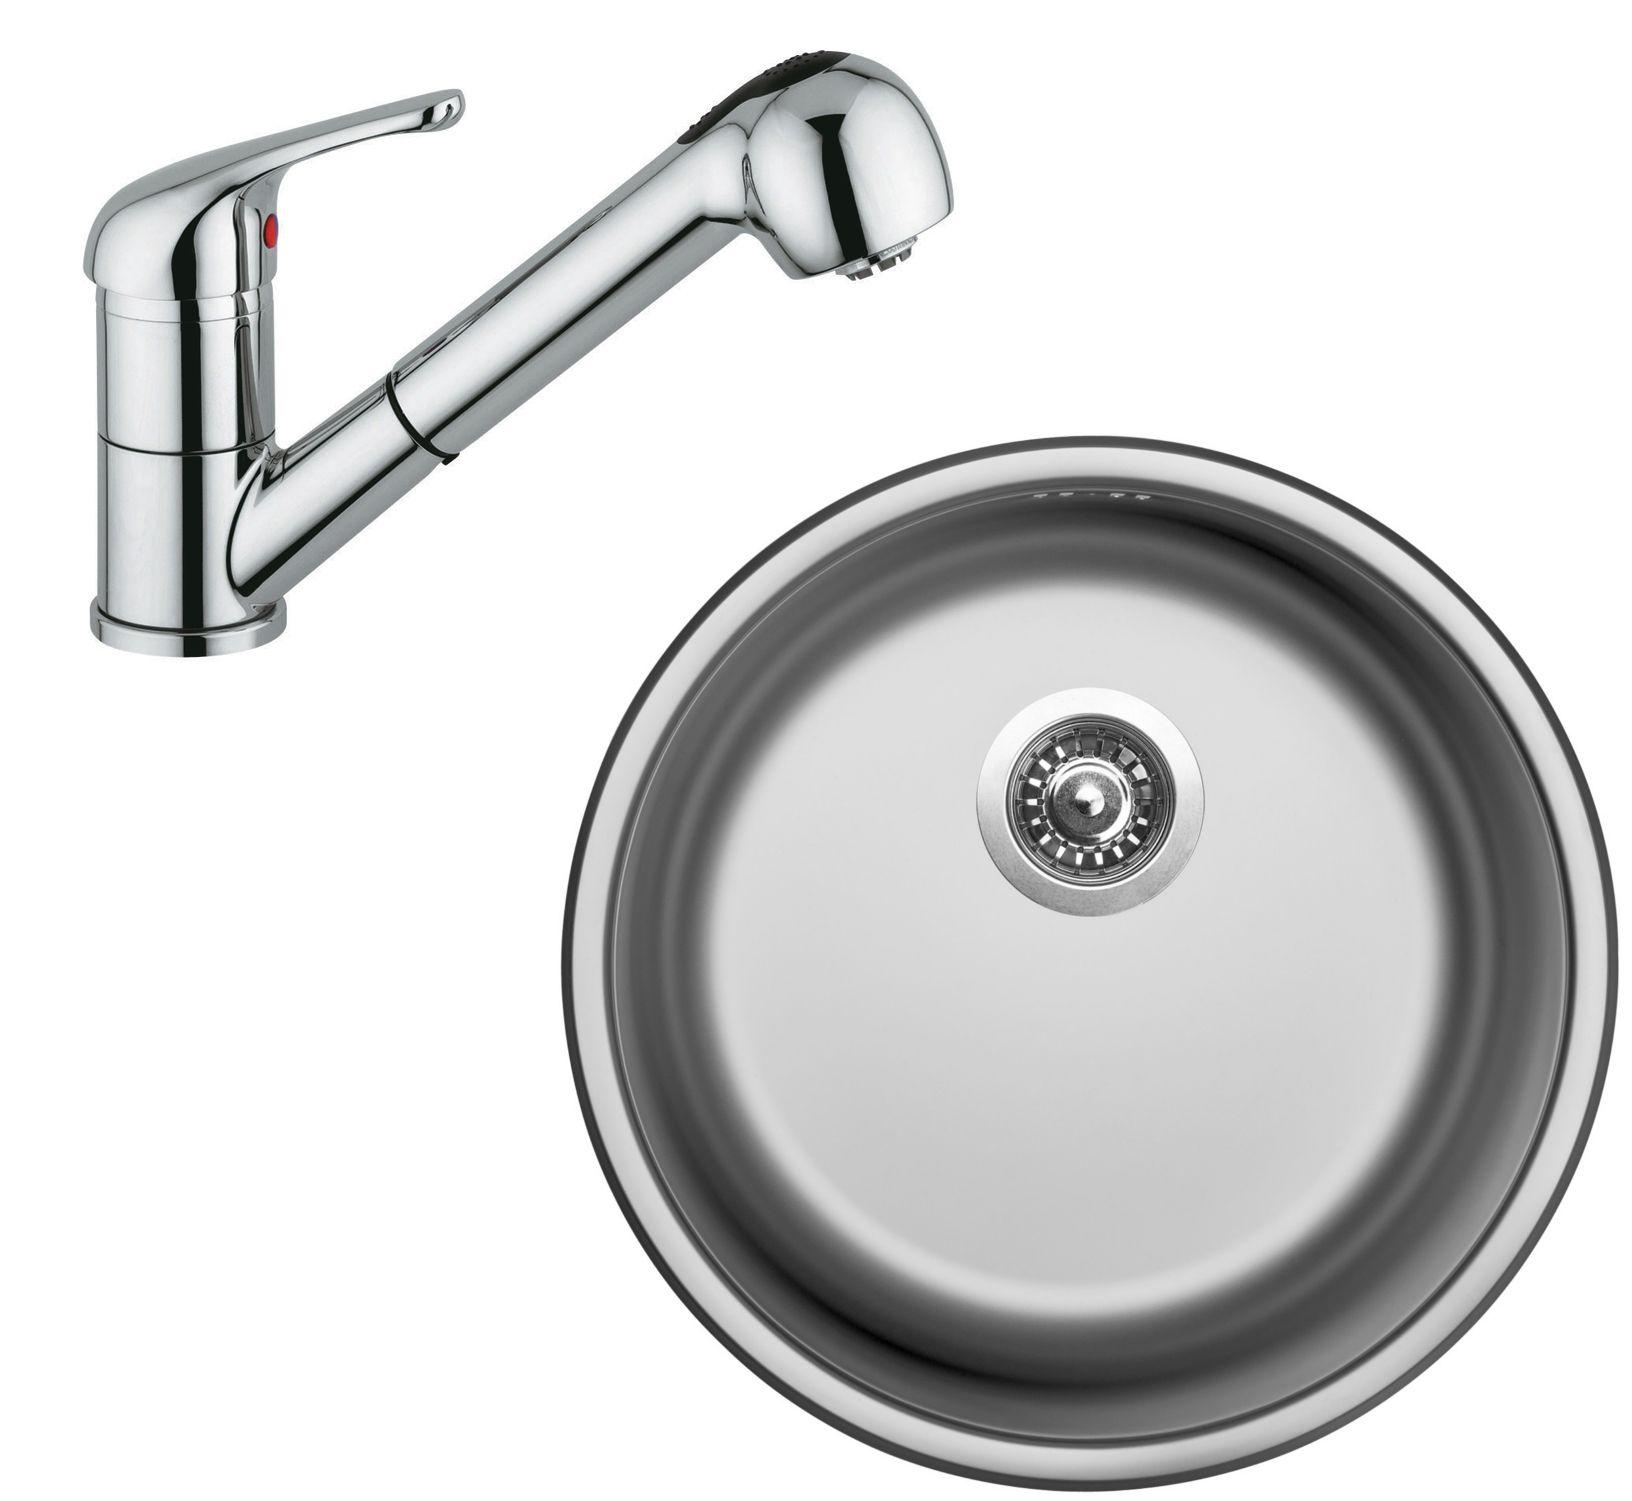 Set Sinks (dřez Round 450 V + baterie Vento 4 S)